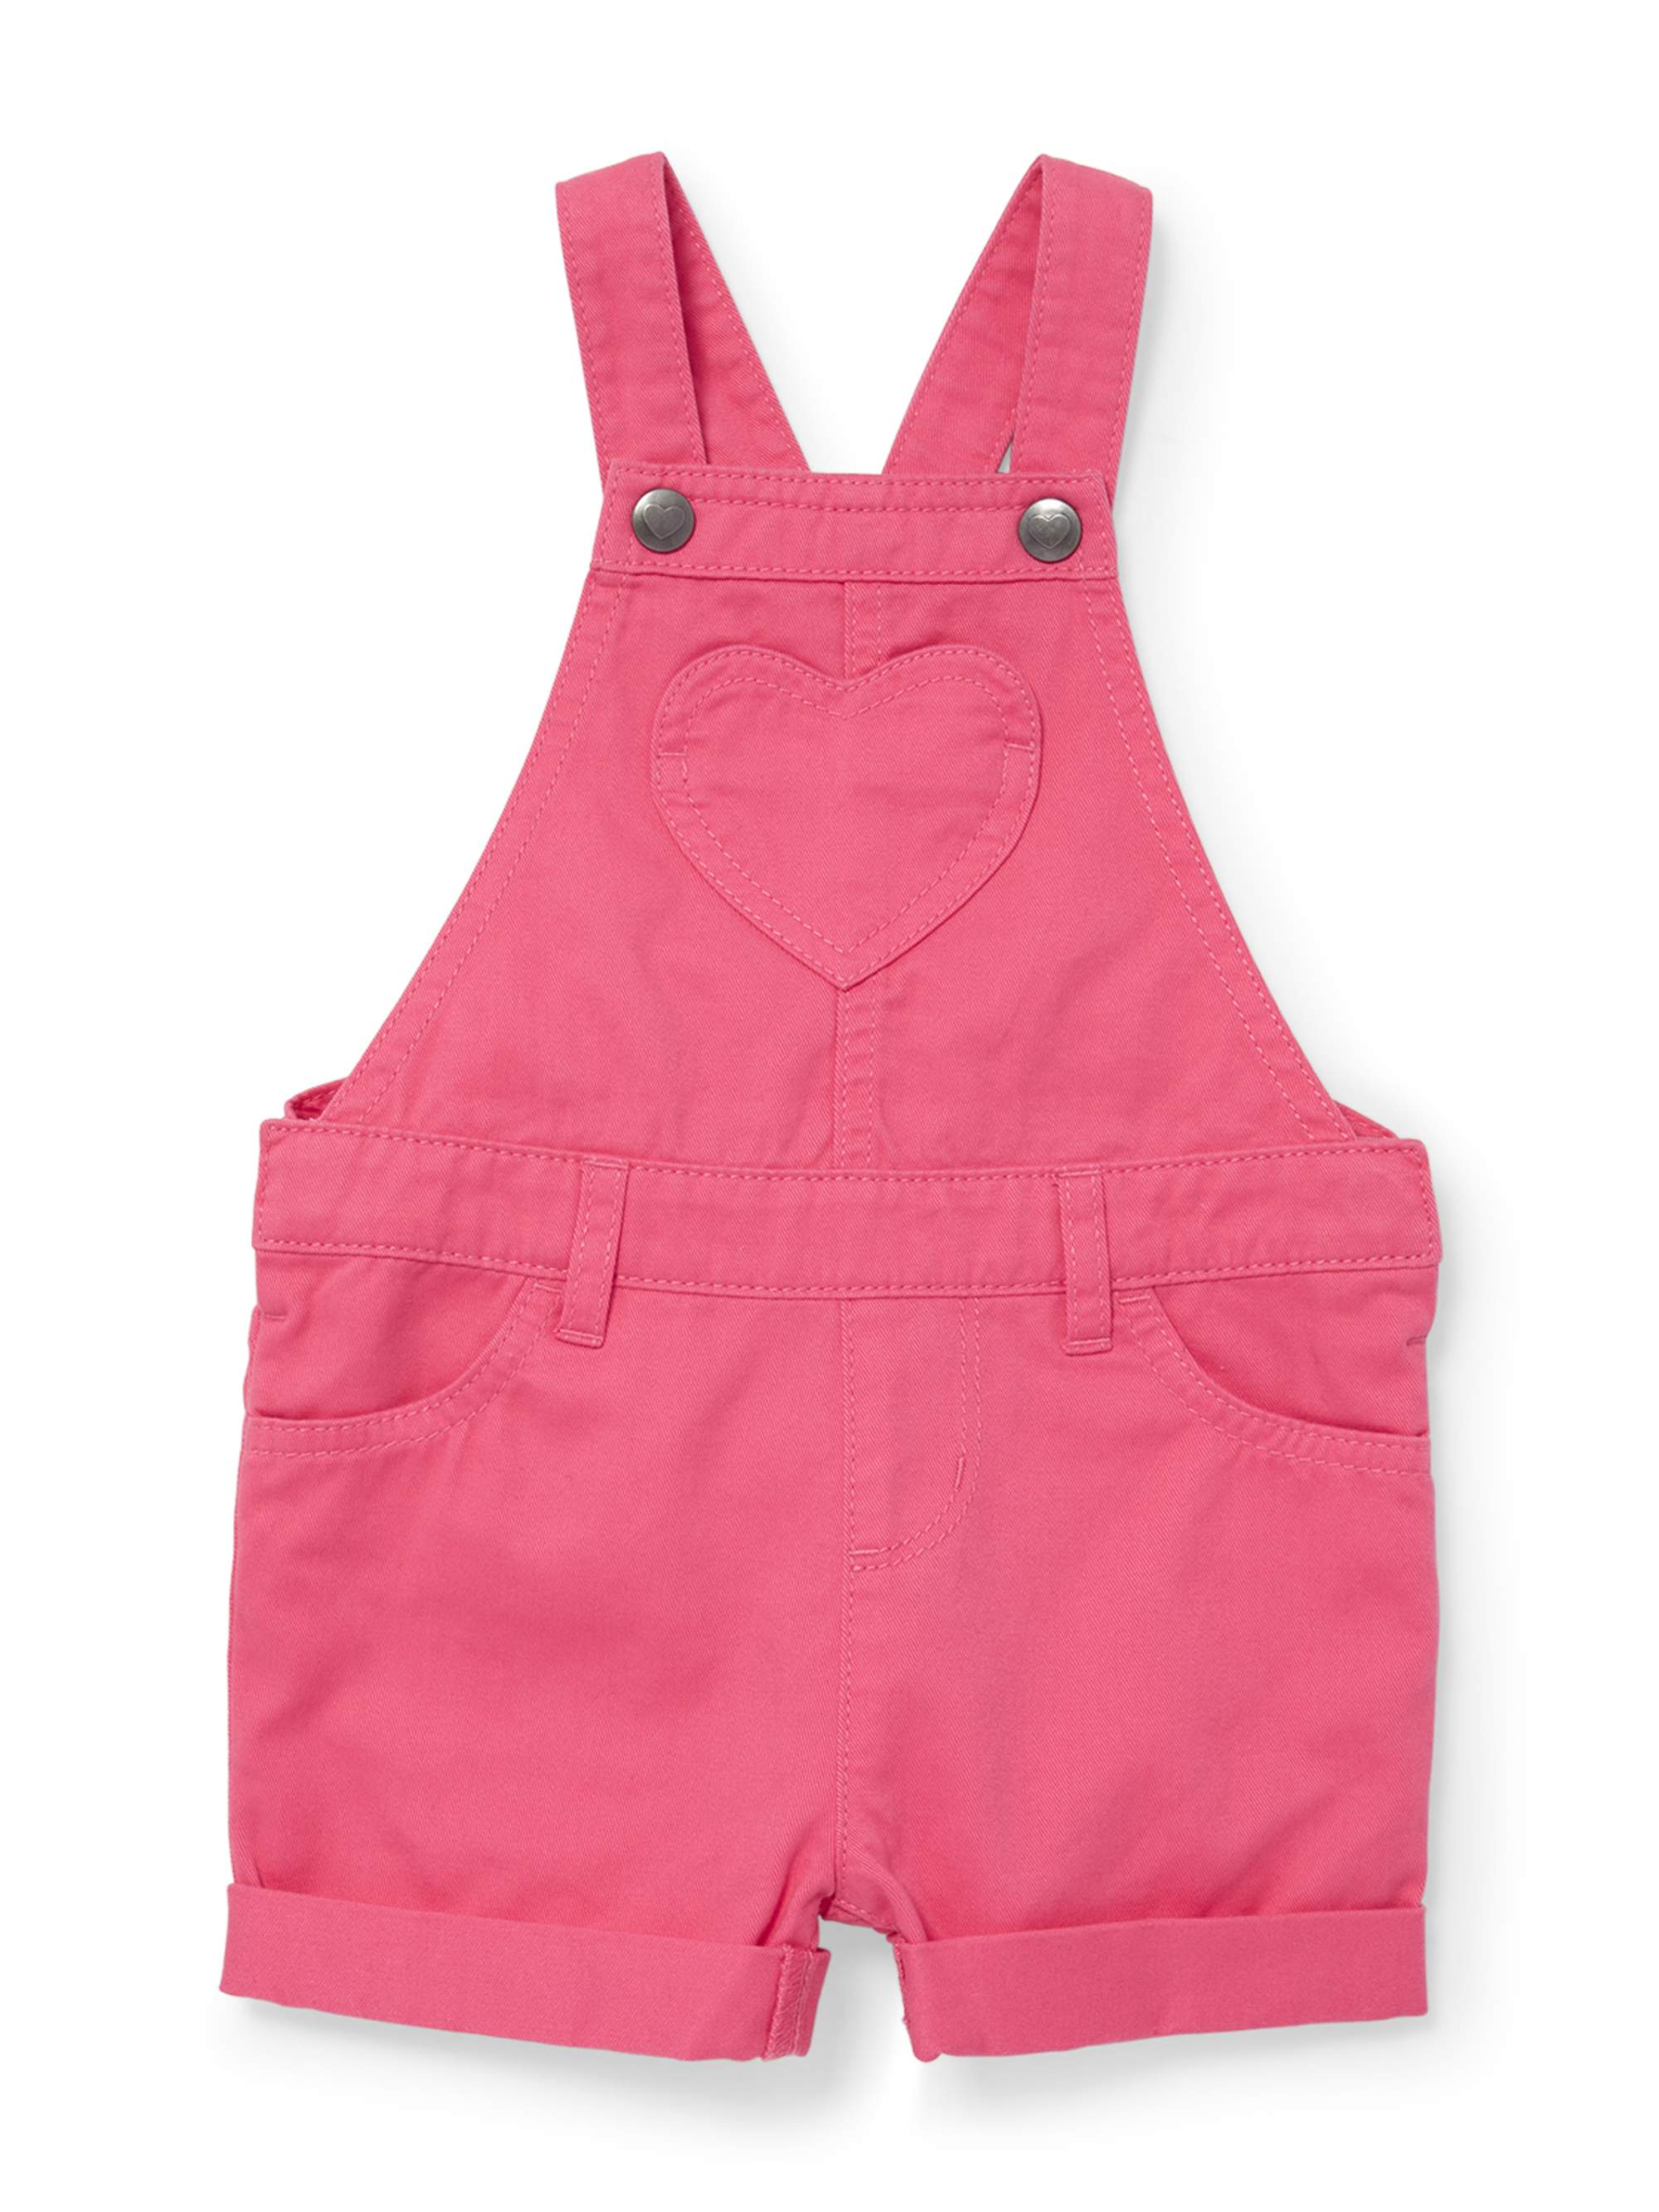 Pink Solid Denim Shortalls (Baby Girls & Toddler Girls)